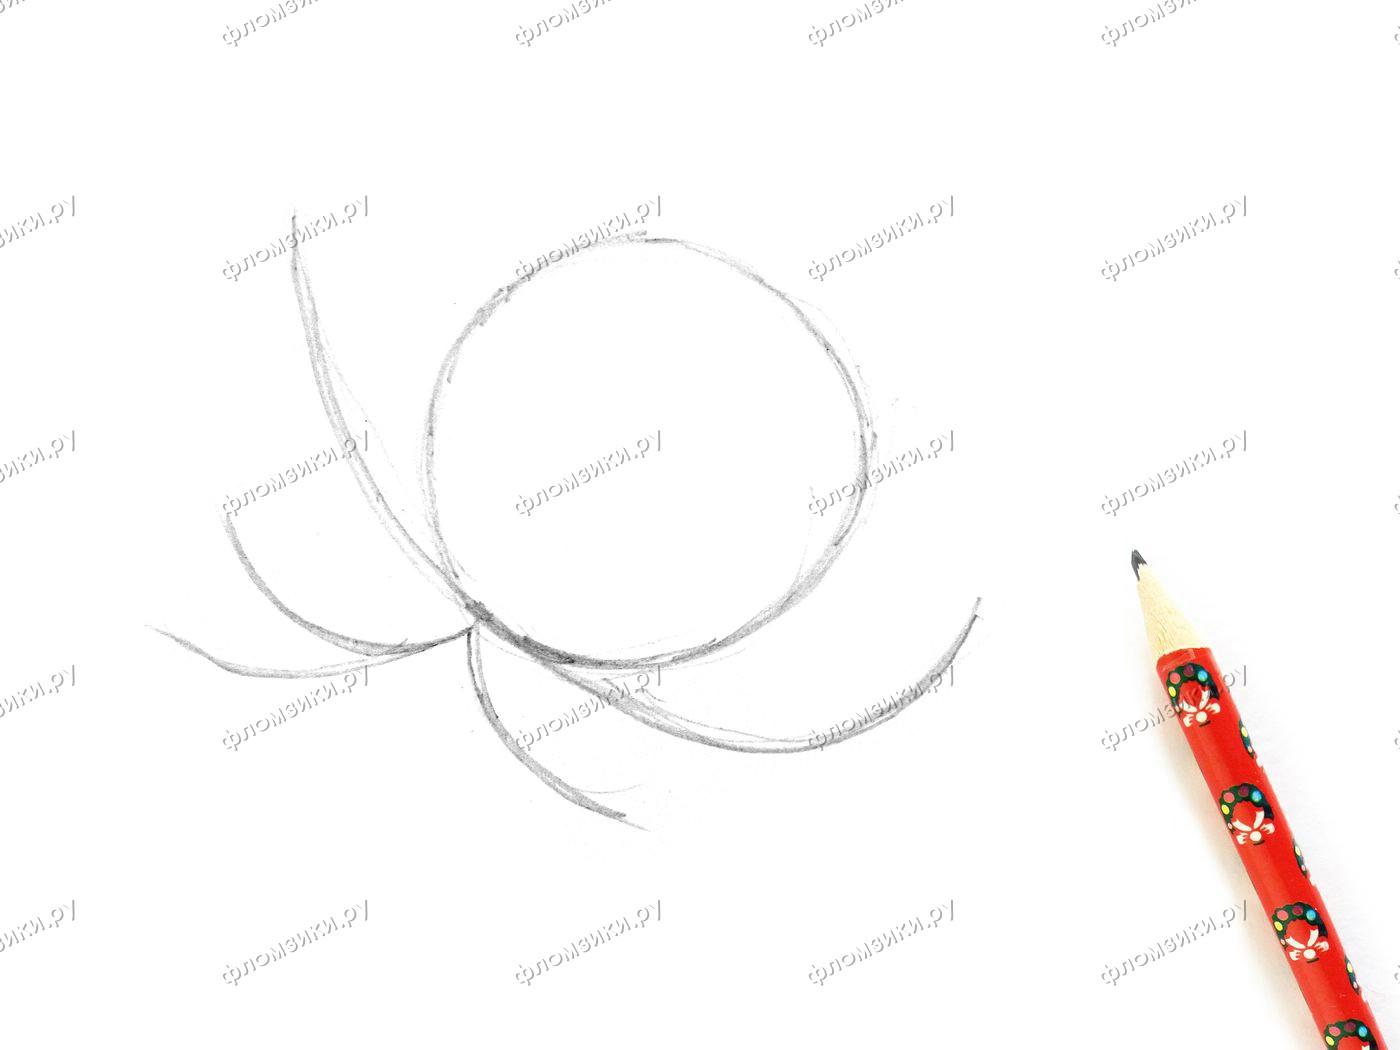 Как нарисовать кувшинку поэтапно